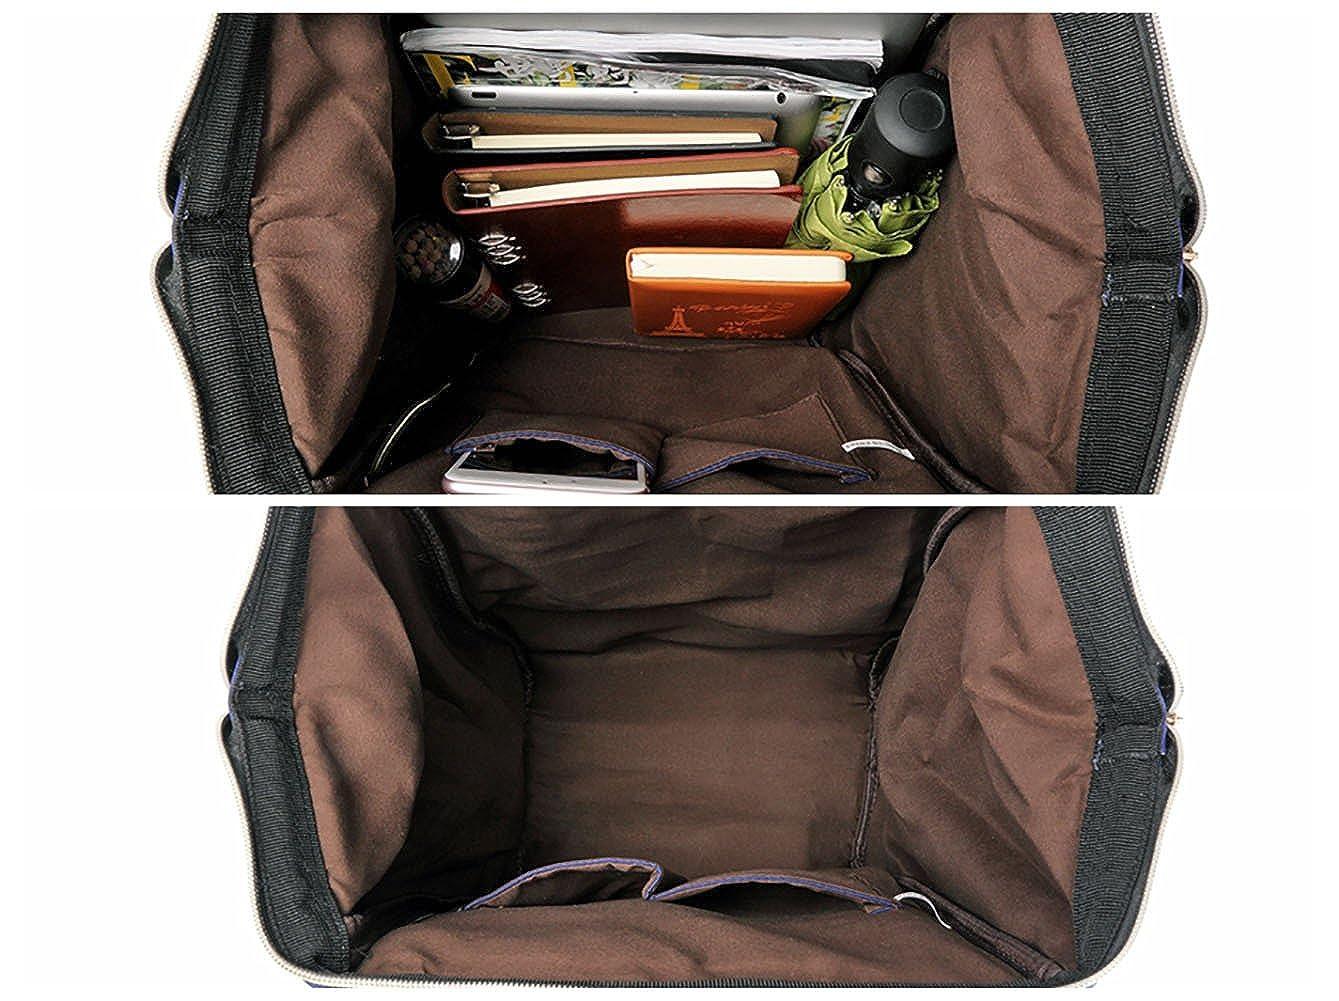 Plover Women/'s Printing Canvas Backpack Handbag Rucksack Student School Bookbags